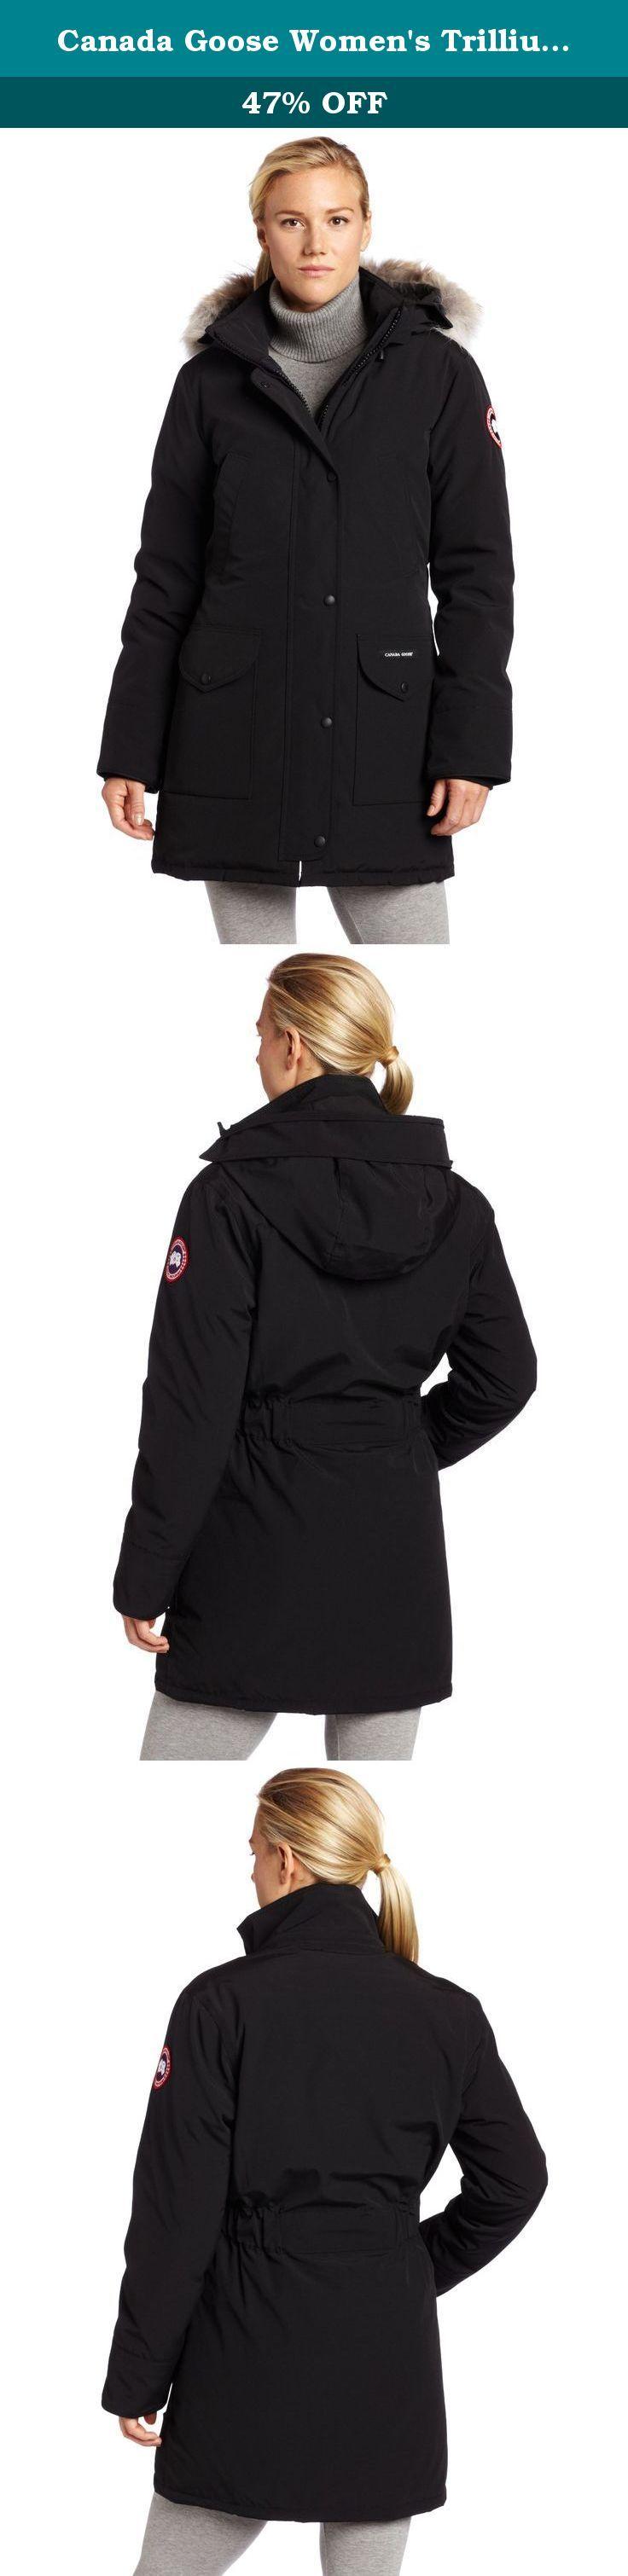 Canada Goose Women's Trillium Parka,Black,Medium. A stylish modern take on our classic Ladies Trillium Parka with a fashionable, high sheen Poly/Nylon sheen.